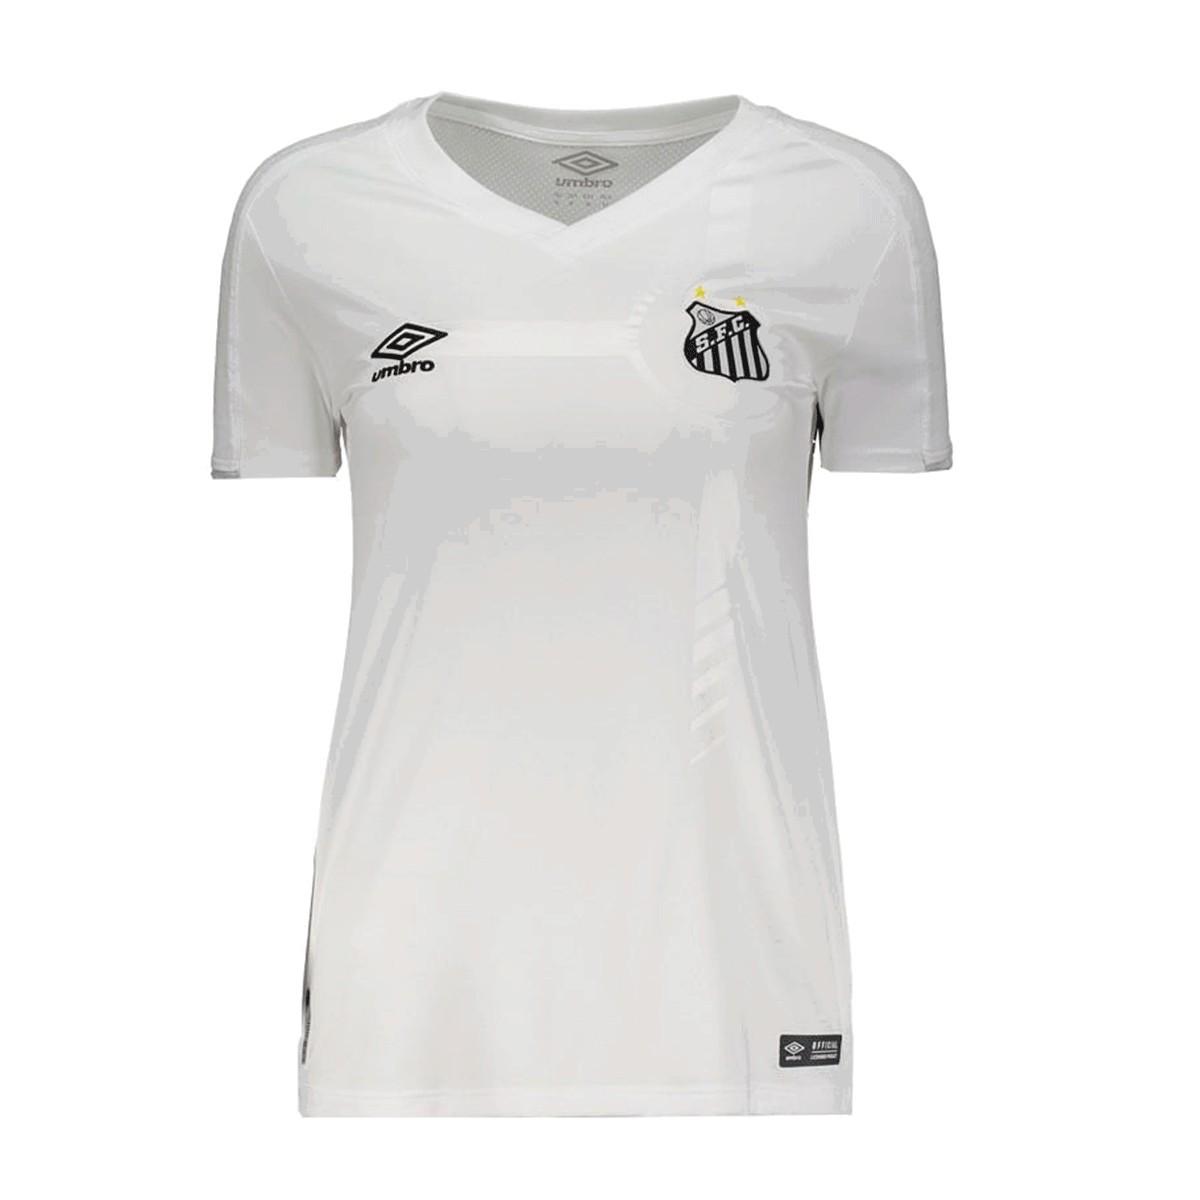 Camisa Santos Umbro Home Feminino 19 20